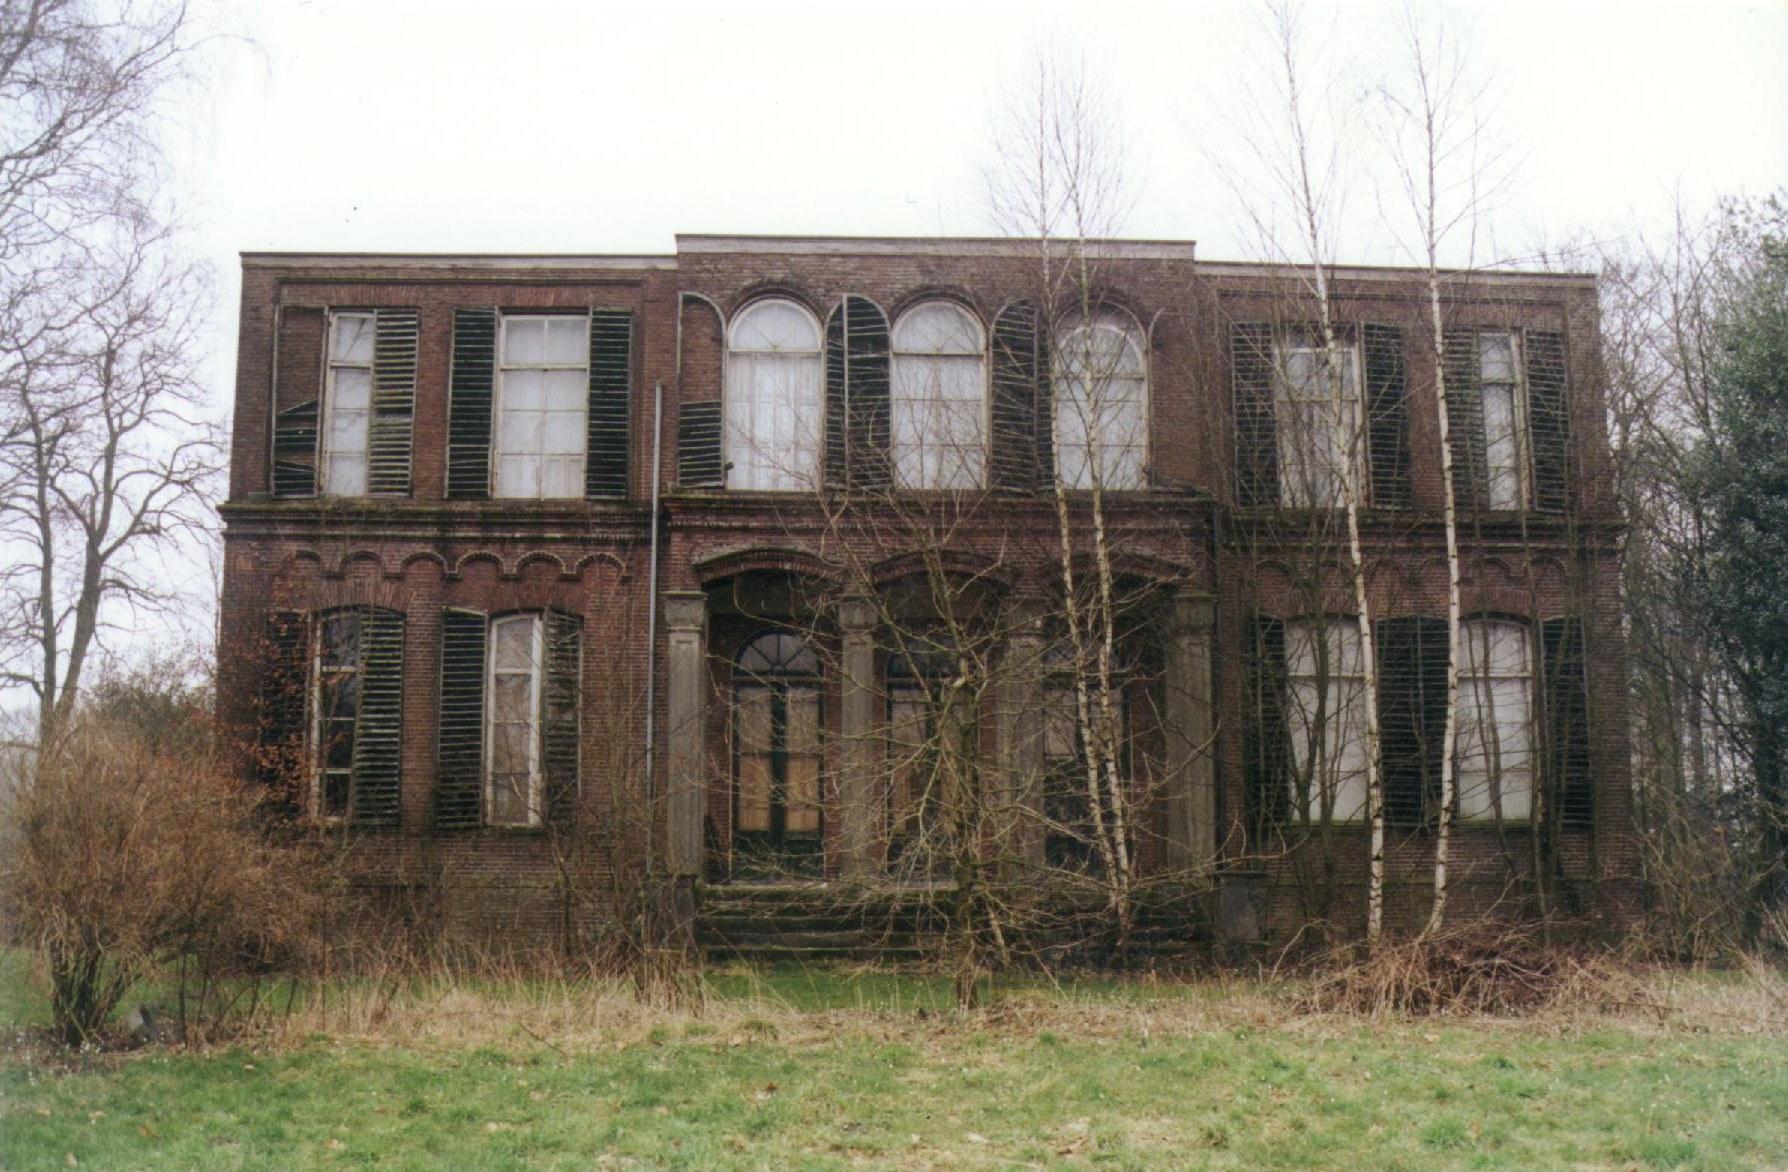 De Wientjesvoort in 1999, ernstig verwaarloosd na brand en decennia verwaarlozing.